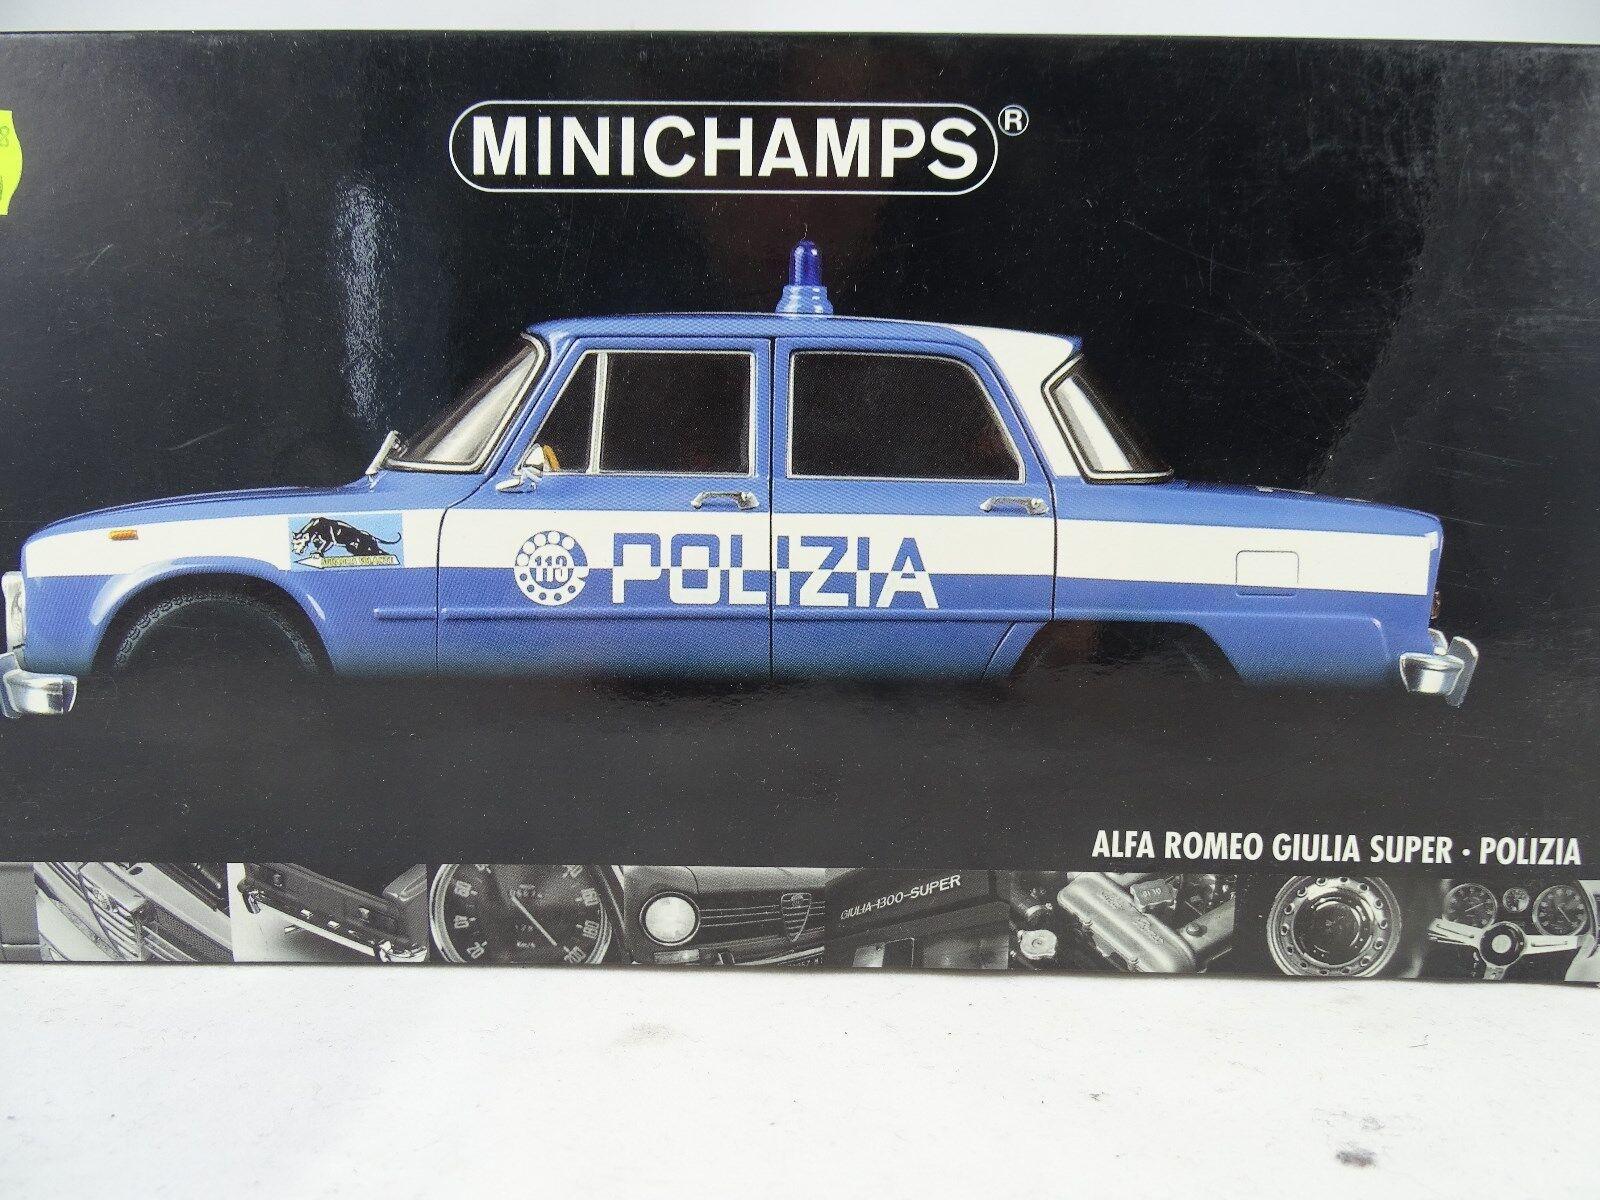 1 18 Minichamps Alfa Romeo Giulia Super polizia azul blancoo rareza §